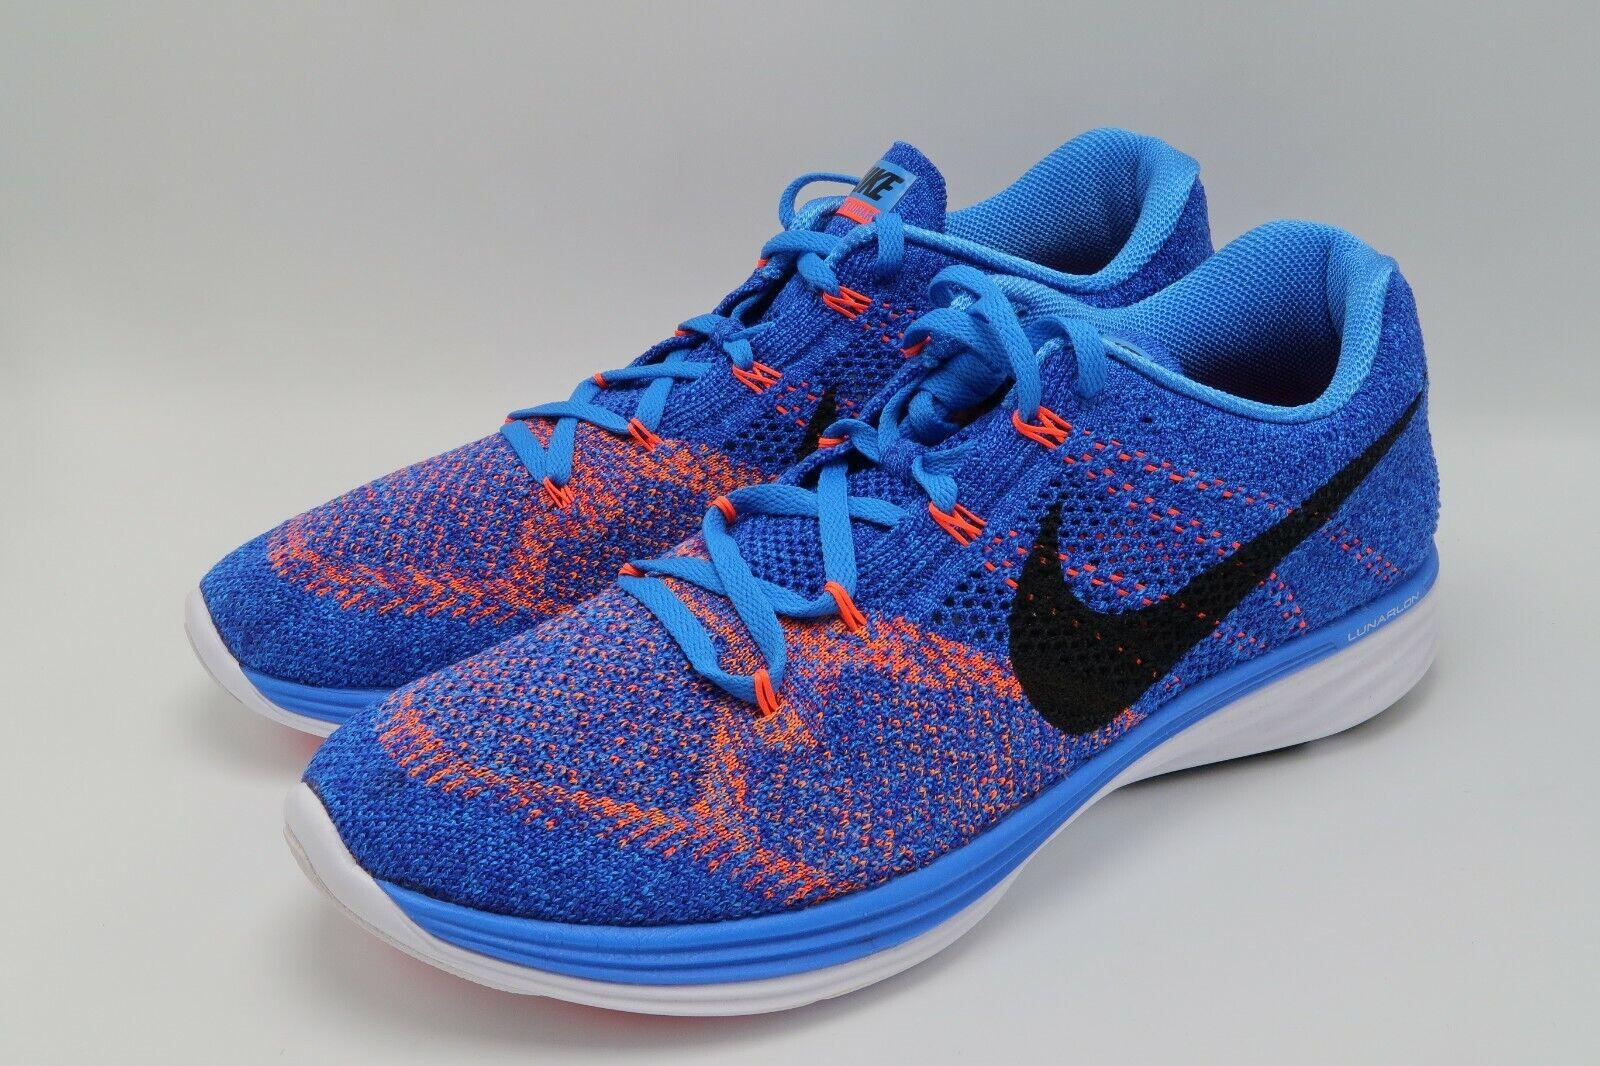 online store f87e9 a58a6 Nike Flyknit Lunar 3 blueee blueee blueee 698181-405 Size 11 new 2bfef0